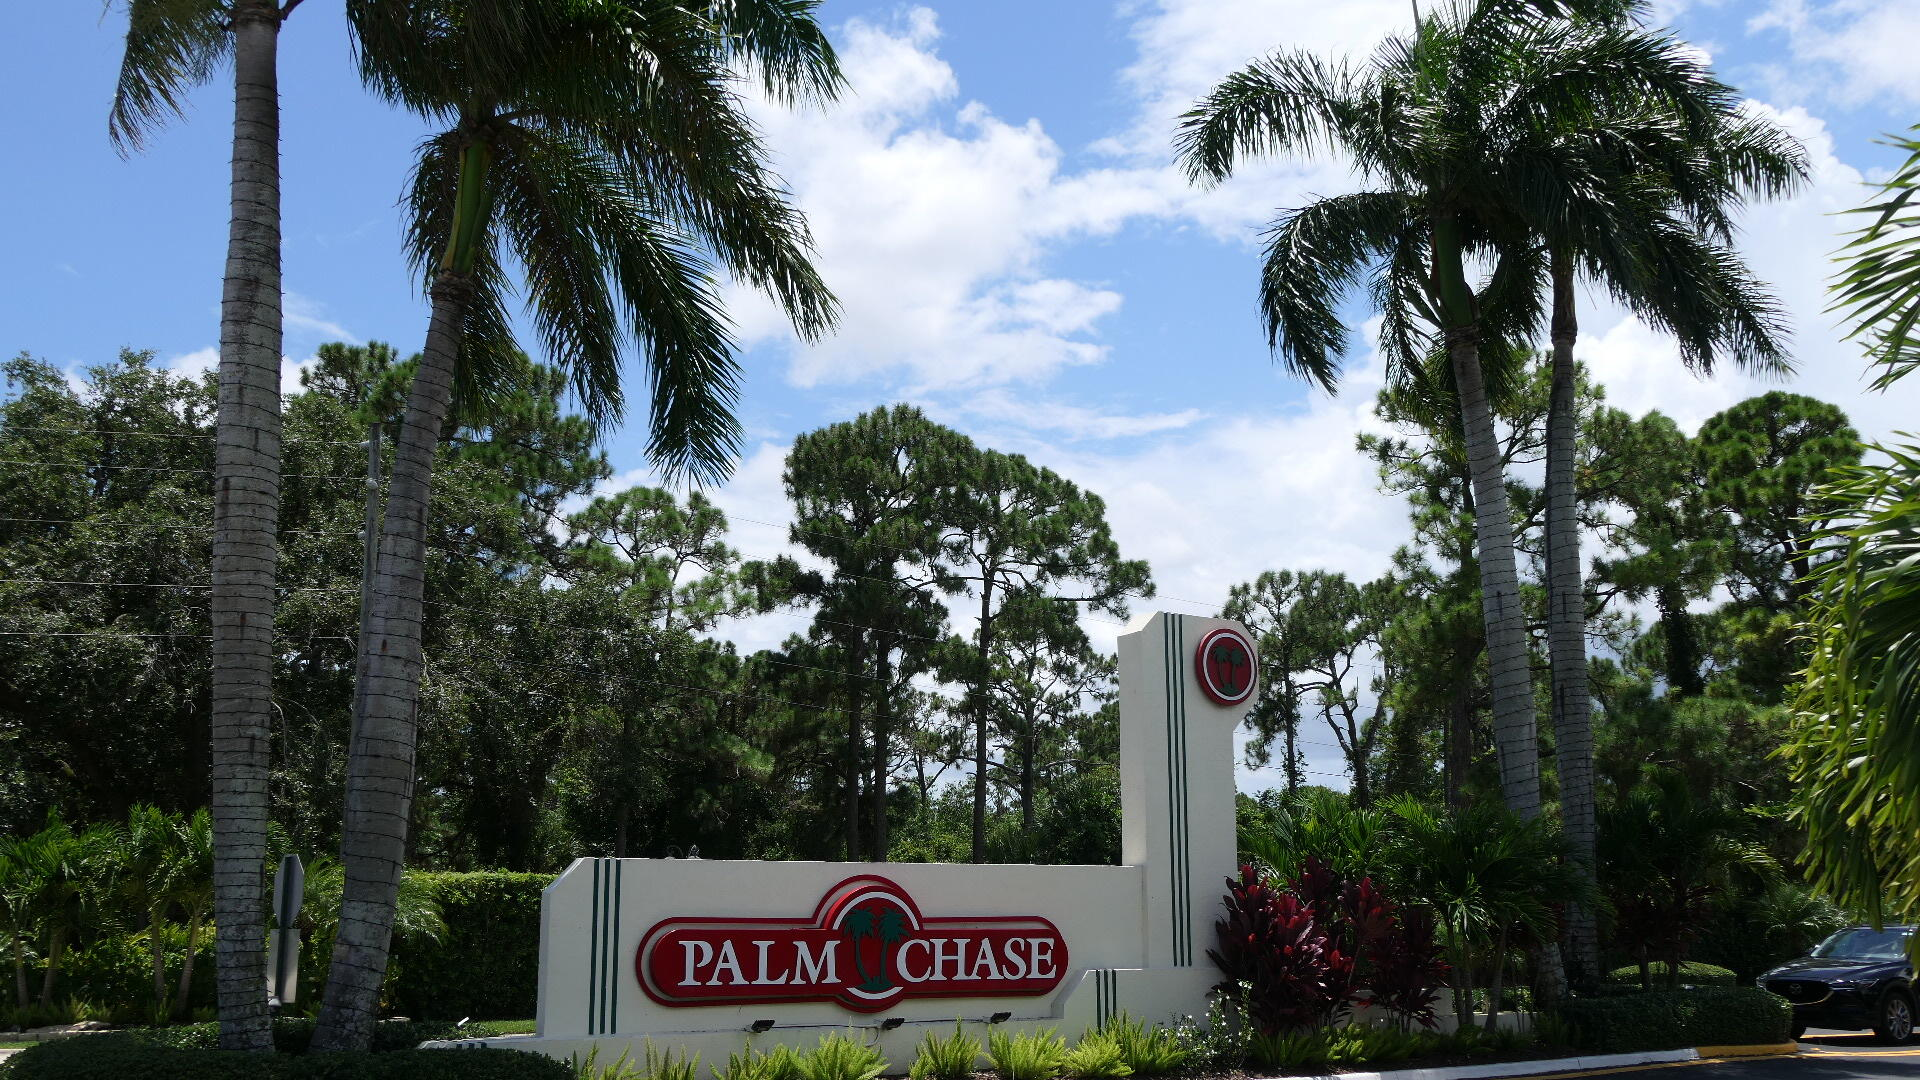 10977 Washingtonia Palm Court B Boynton Beach, FL 33437 photo 1